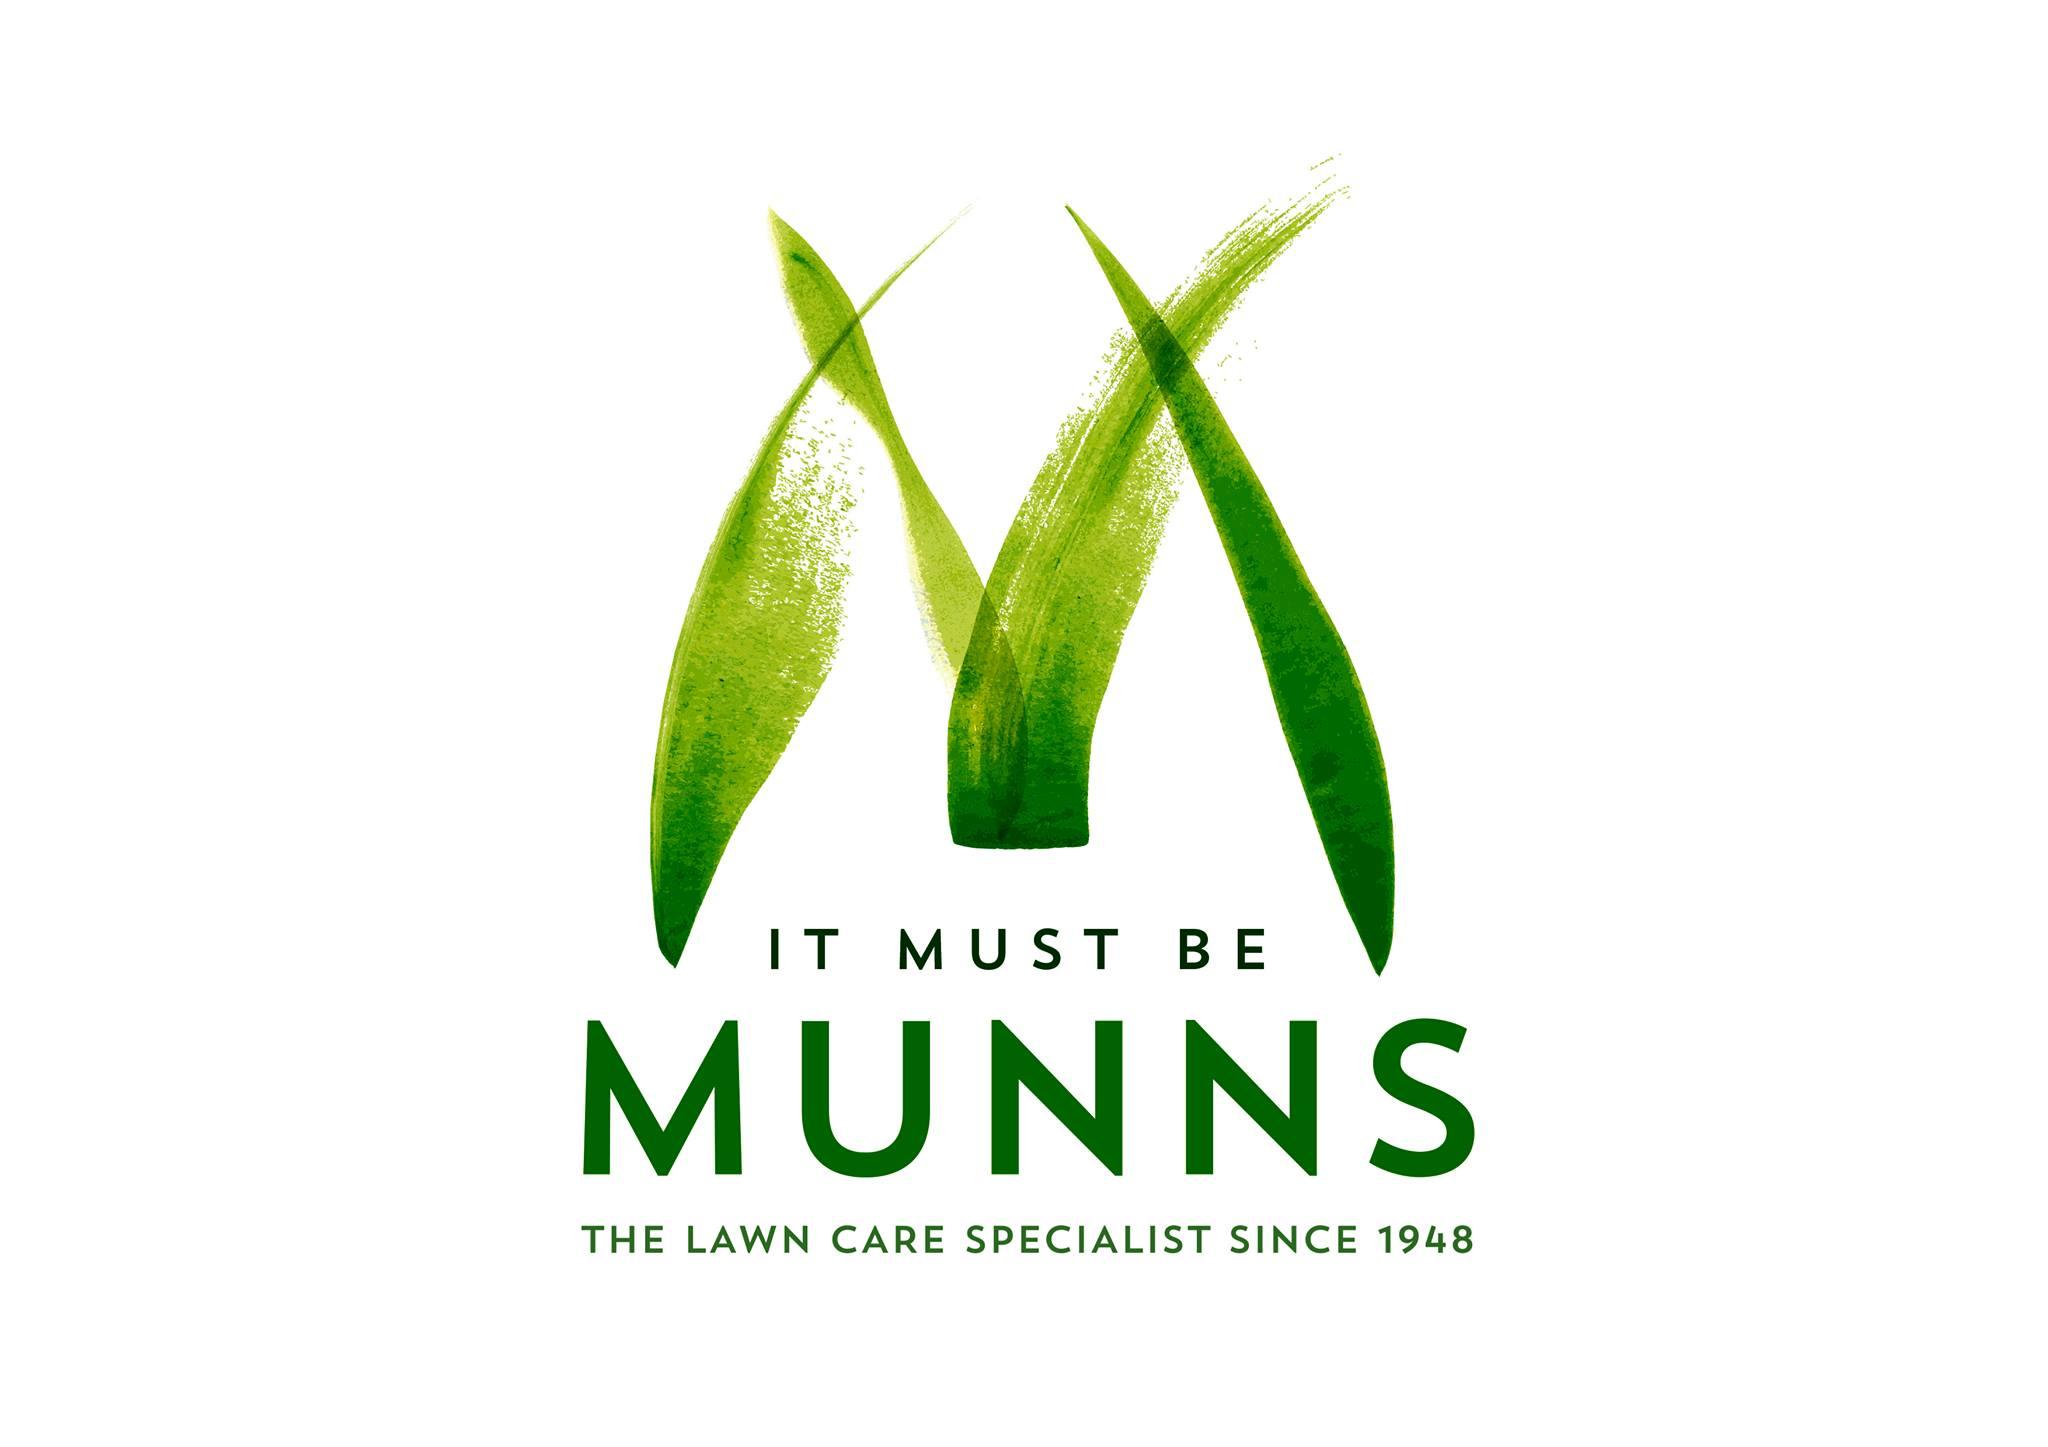 Munns